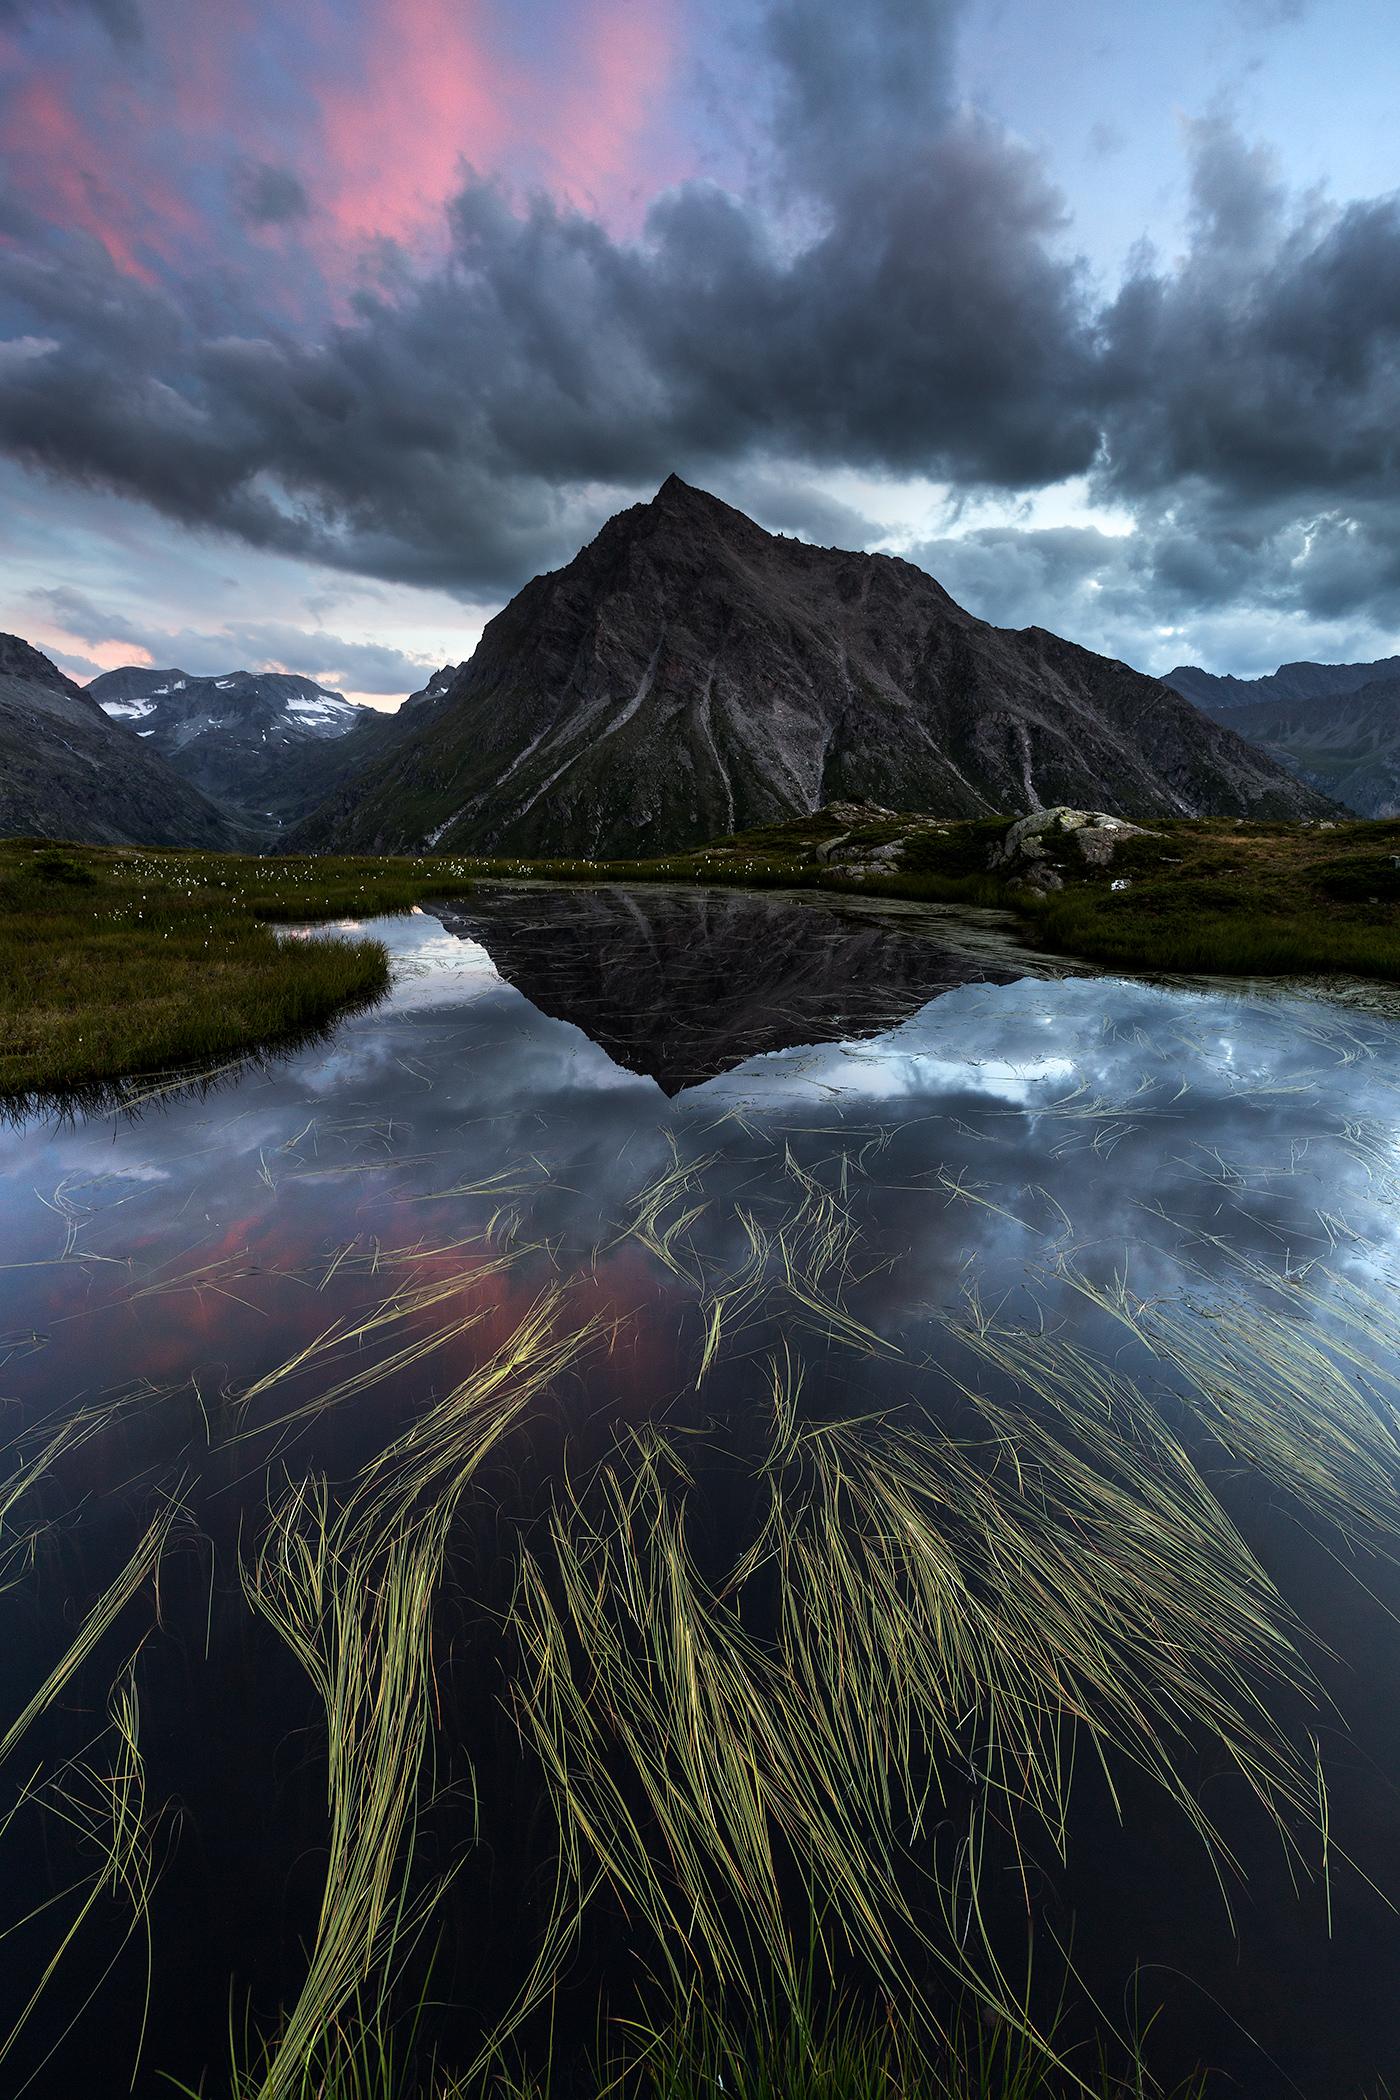 maurienne-alpes-savoir-nicolas-rottiers-photographe-paysage-caen